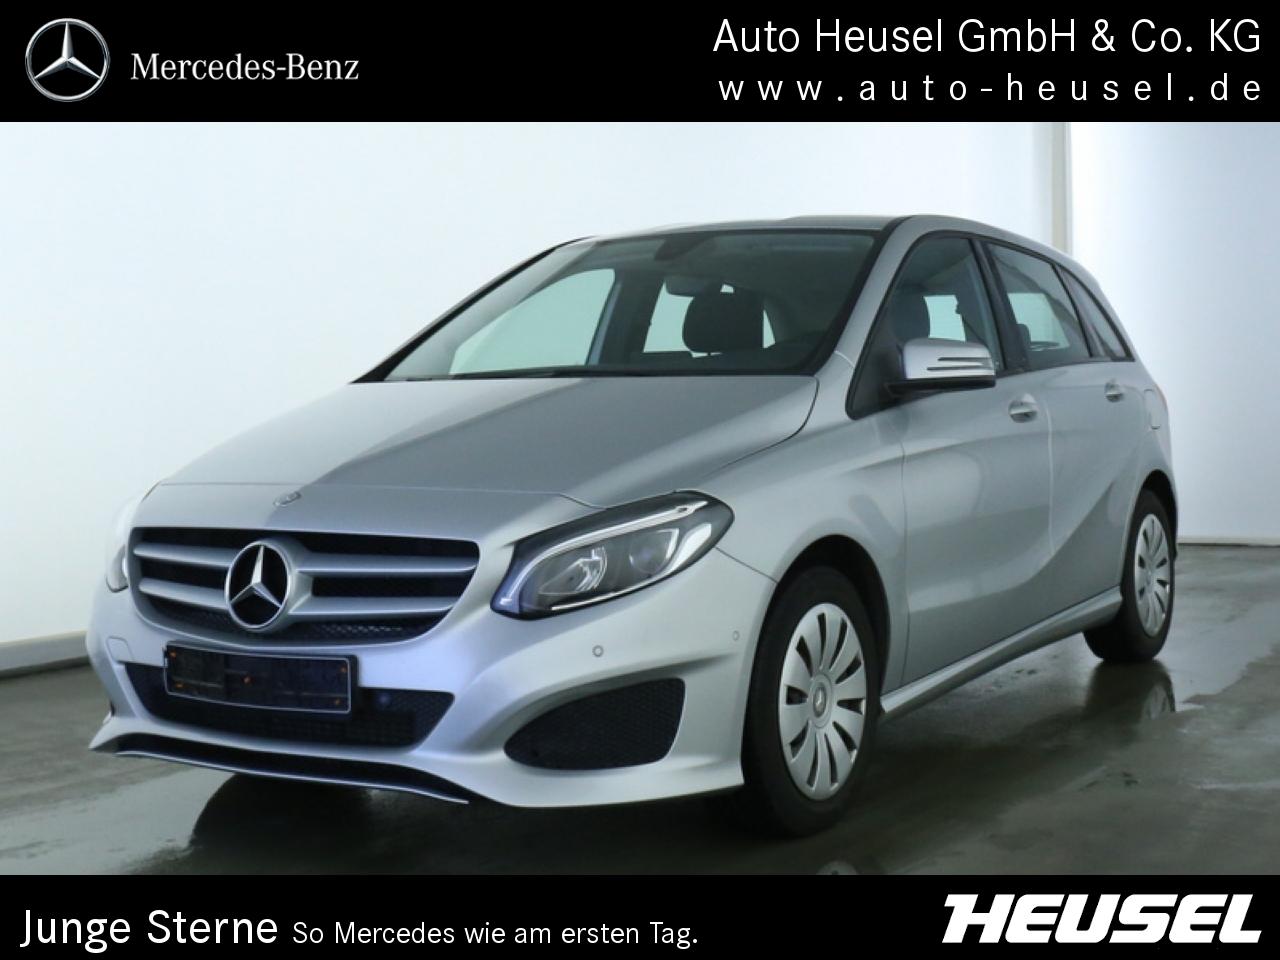 Mercedes-Benz B 220 CDI *Kamera*PDC*LED*Garmin*Bremsassist*, Jahr 2015, Diesel